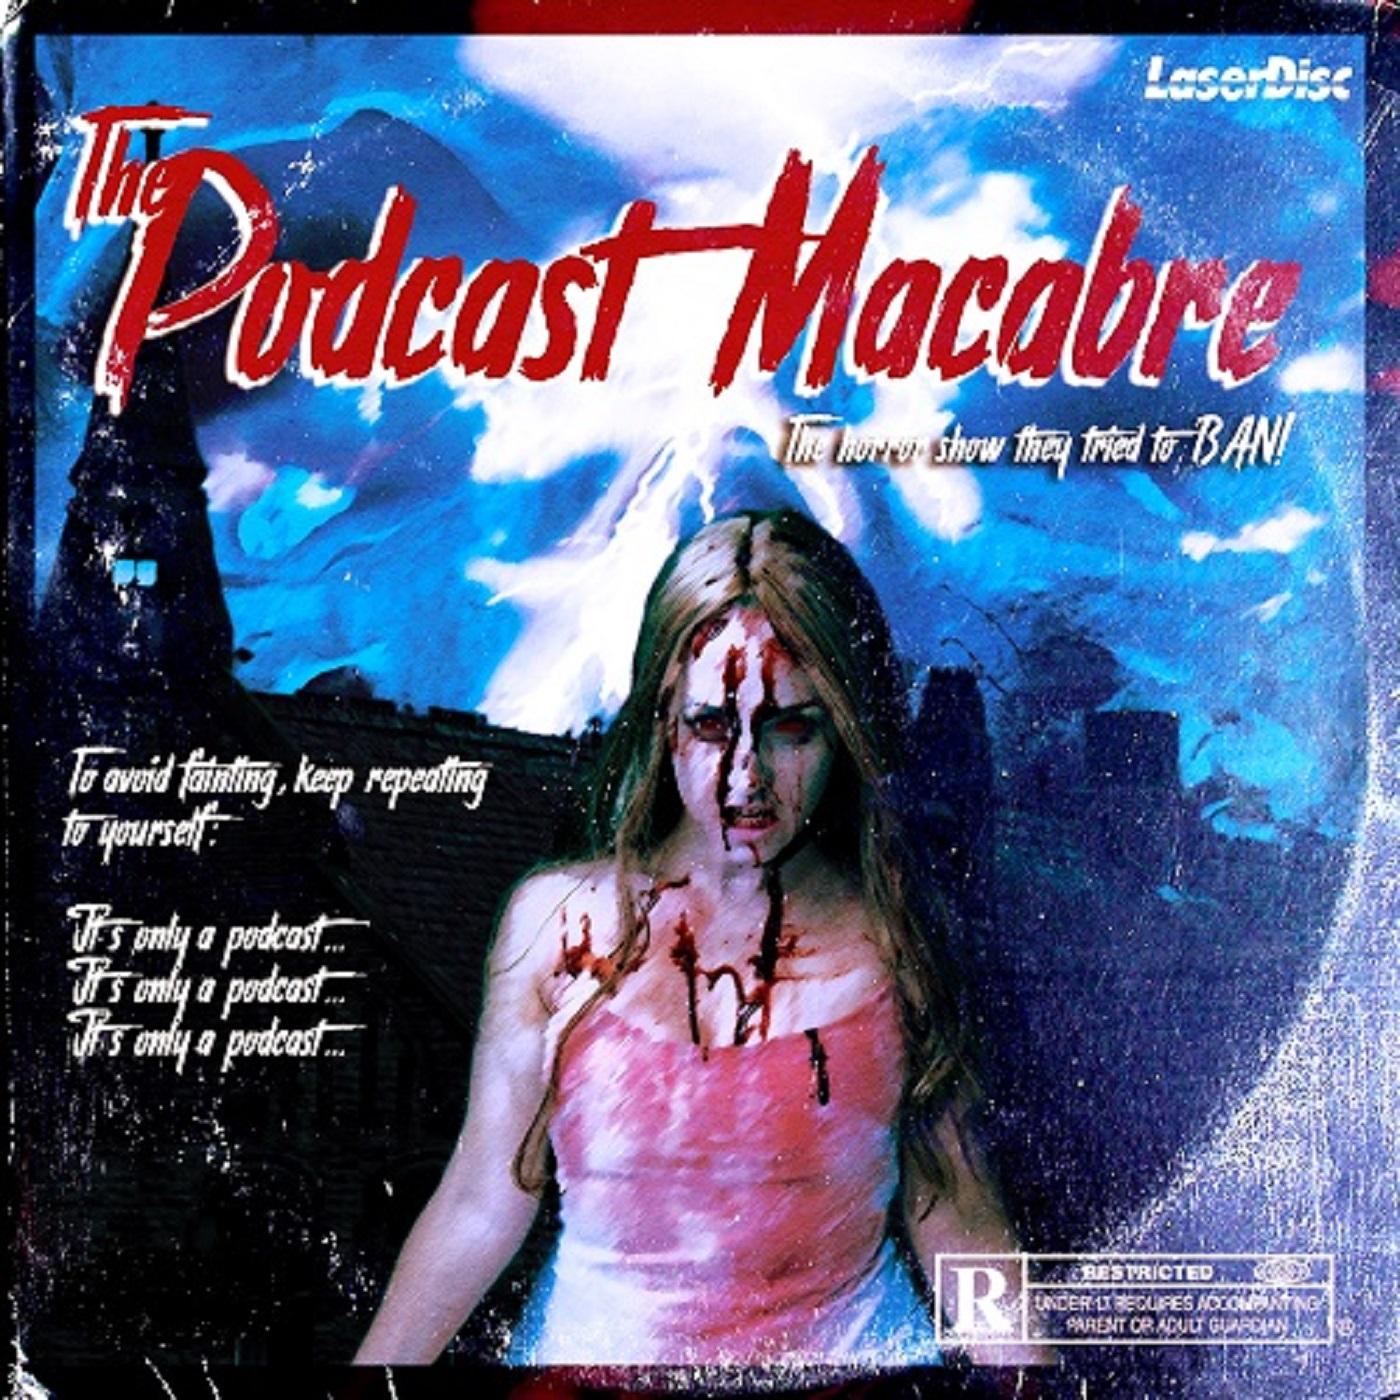 podcast_macabre_1400 -JPEG-iTunes